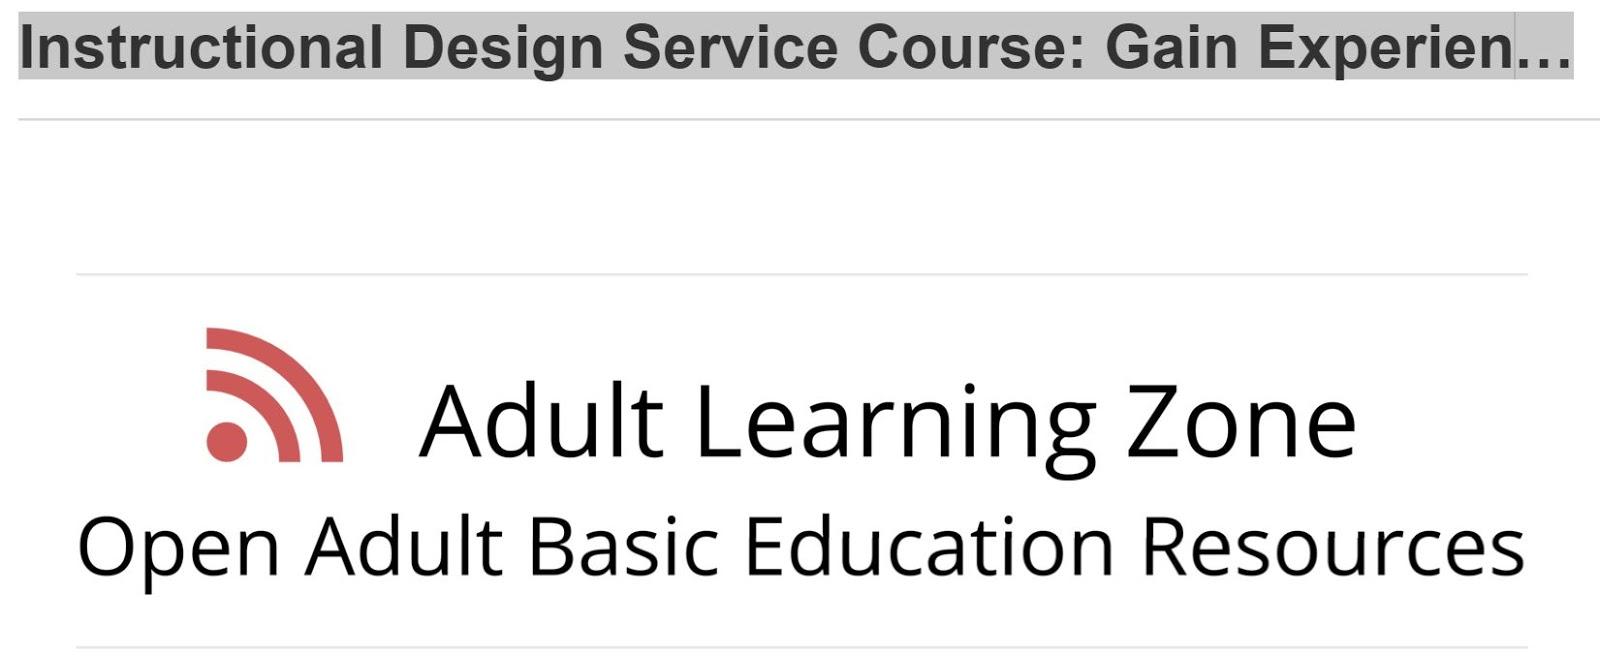 Ignatia Webs 2 Worthwhile Courses Personal Learning Designing